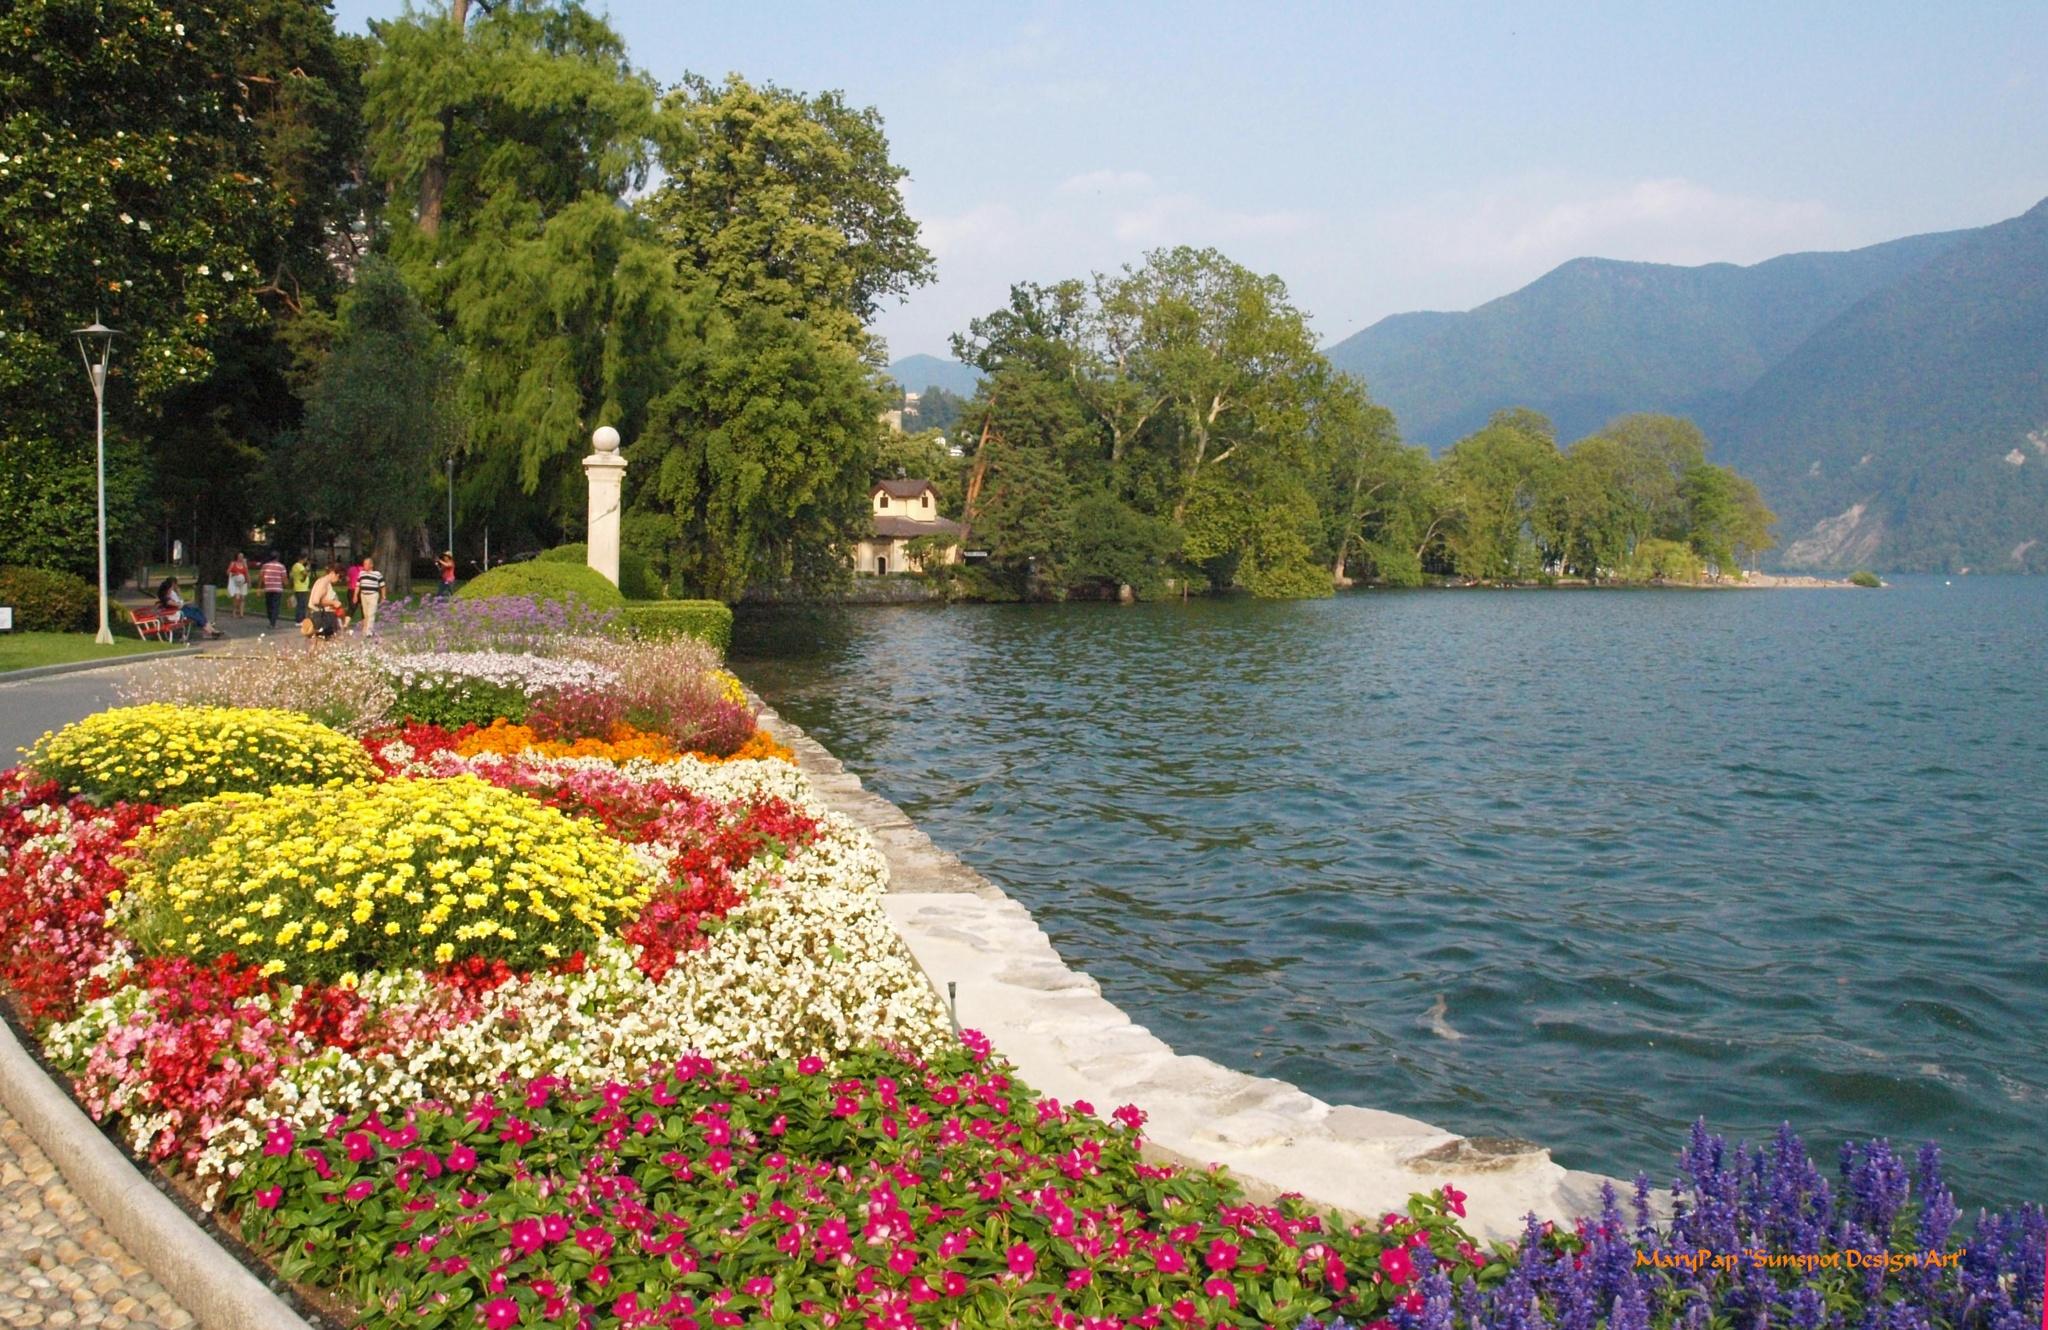 Lake Lugano by Mary Pap